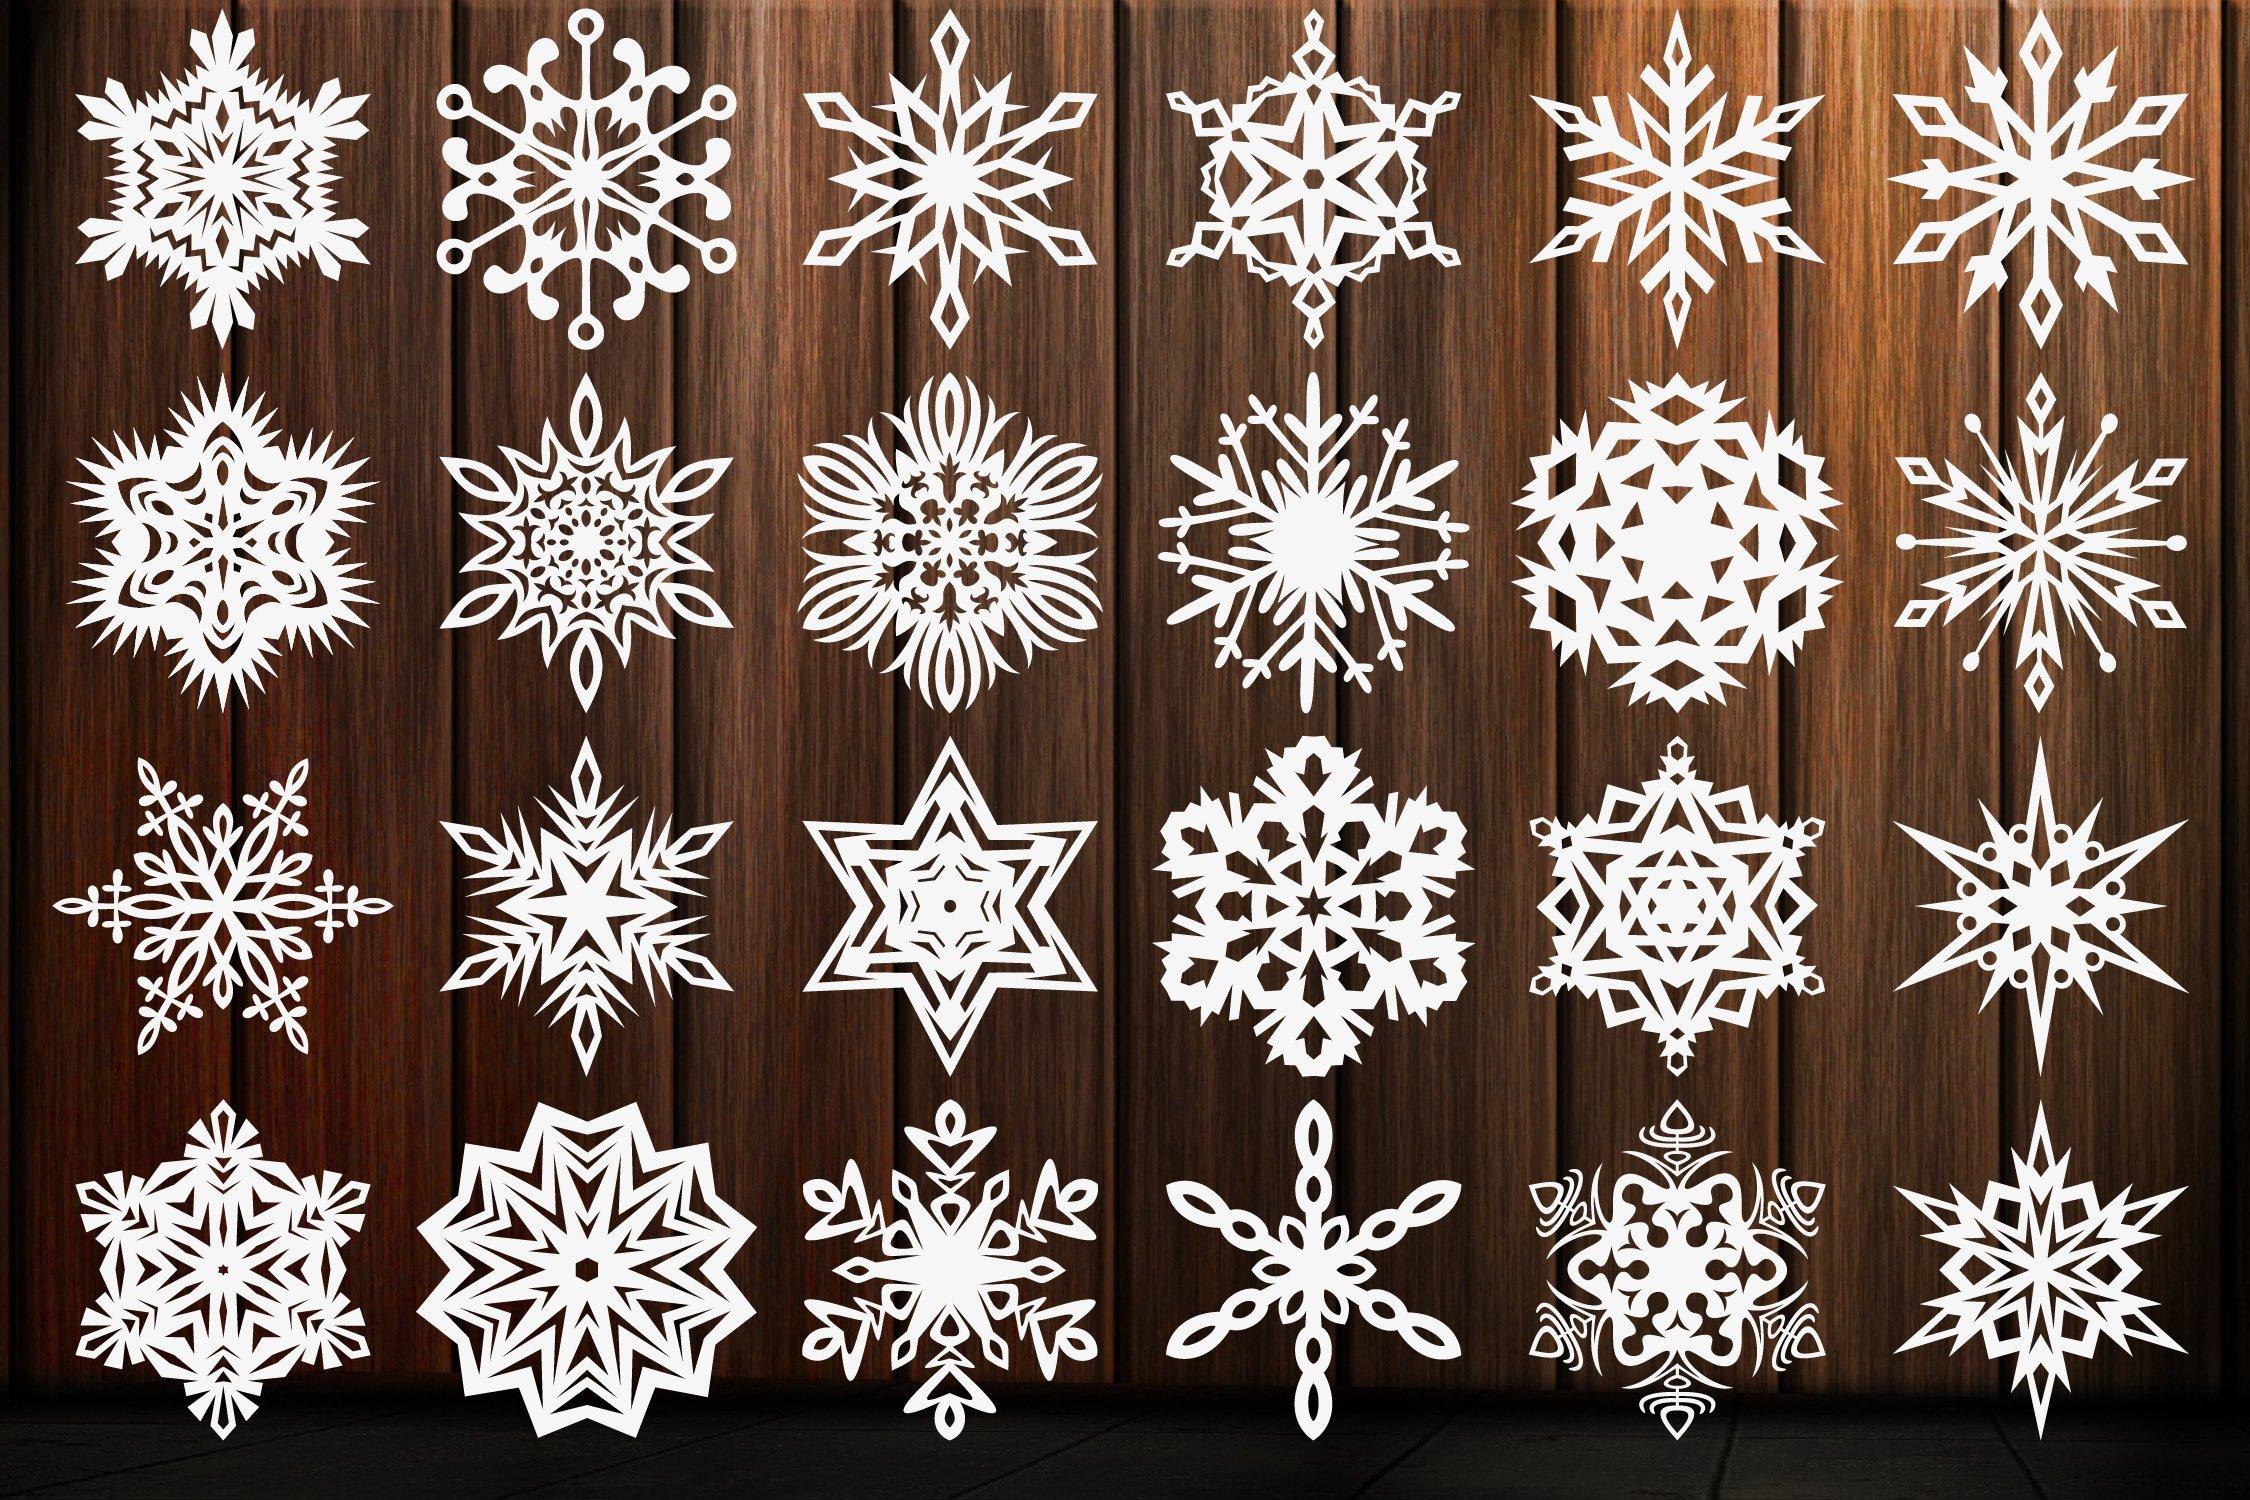 Snowflake SVG, Christmas Snowflakes SVG,